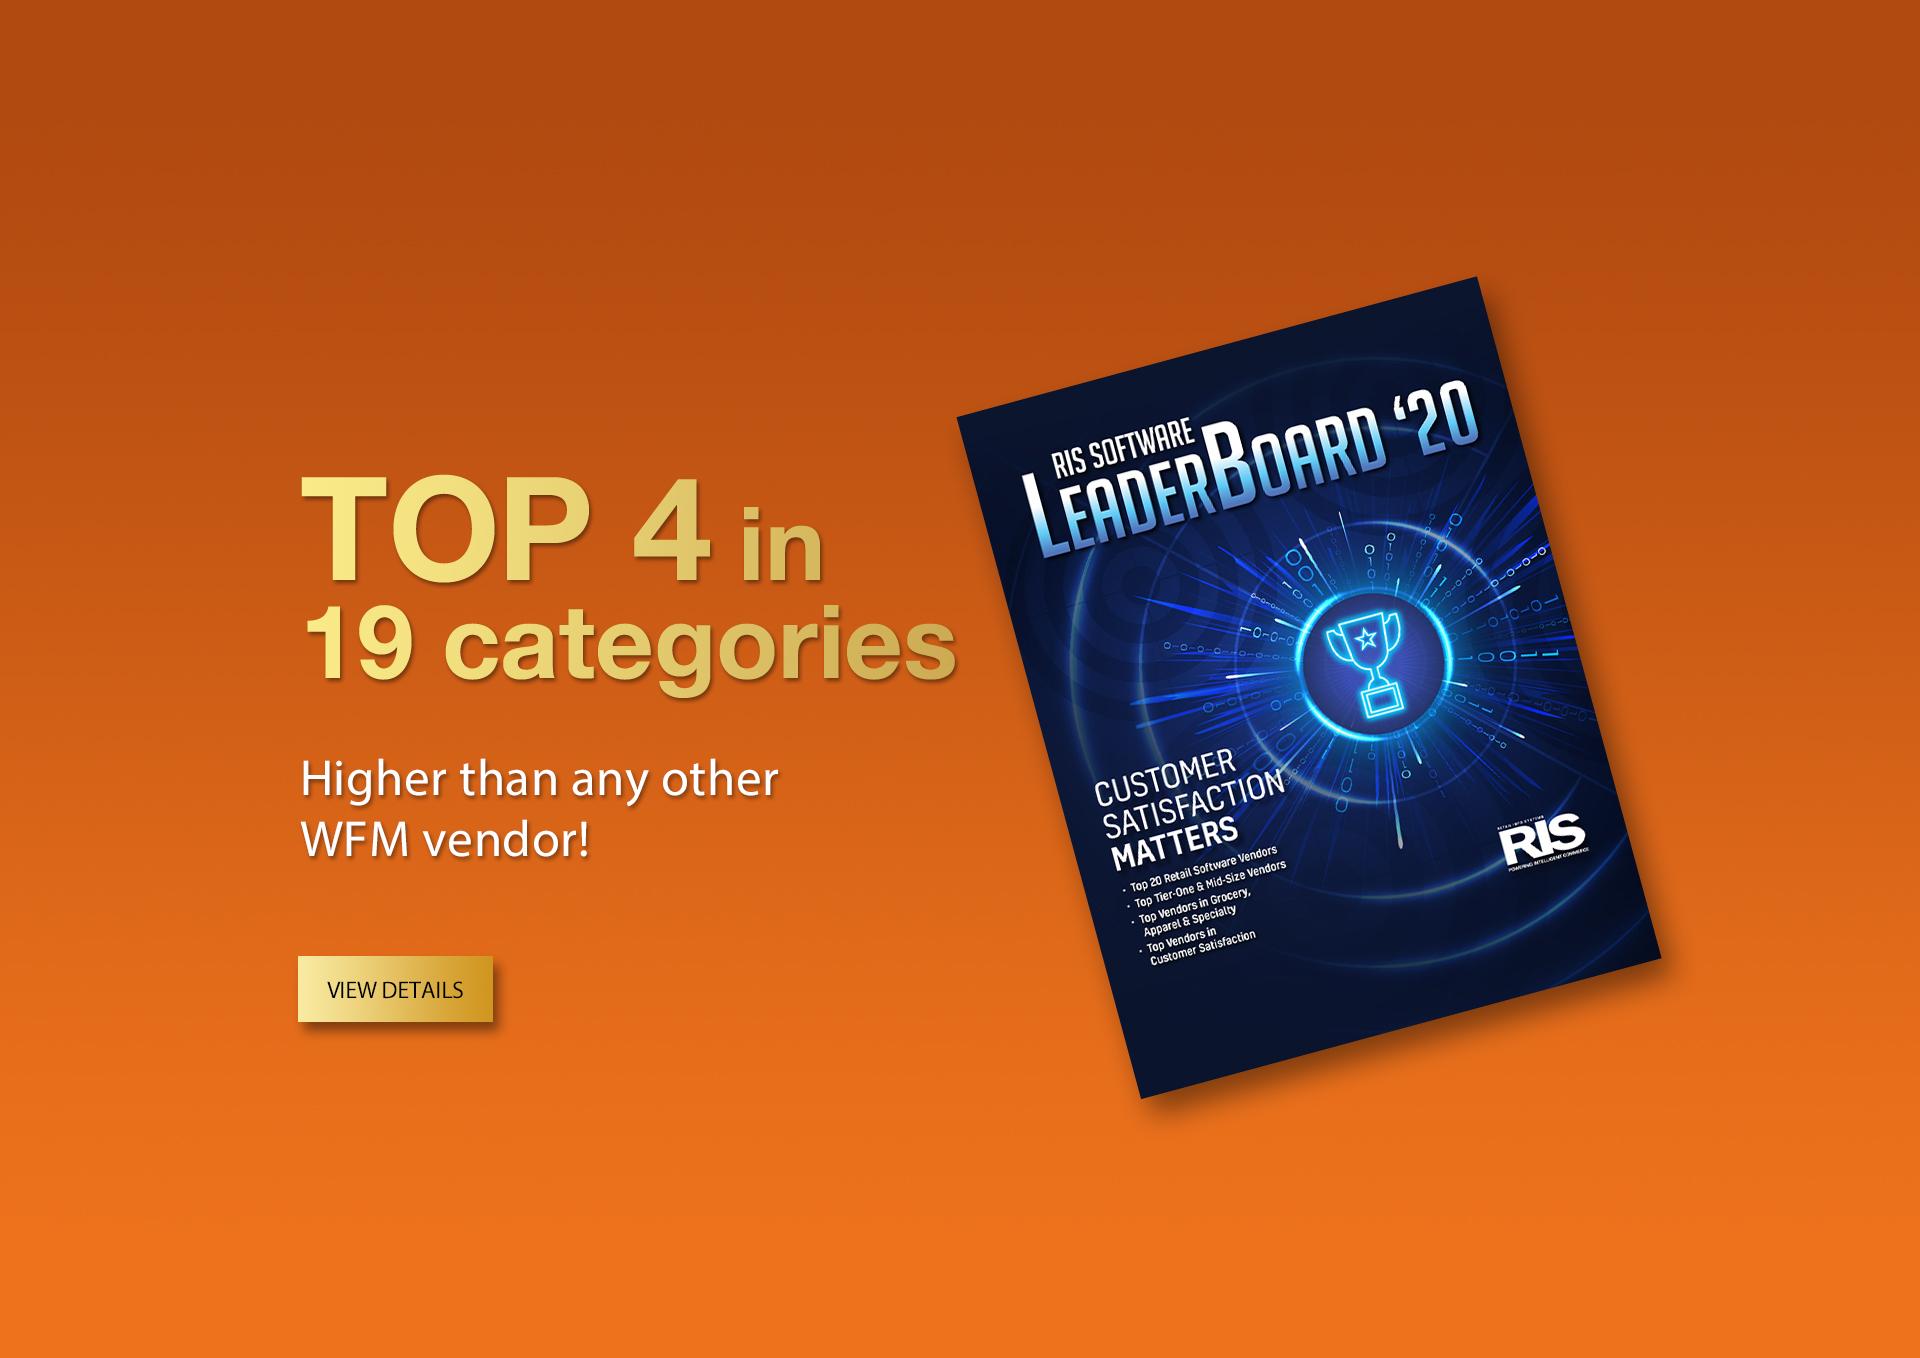 Logile RIS LeaderBoard 2020 web banner top 4